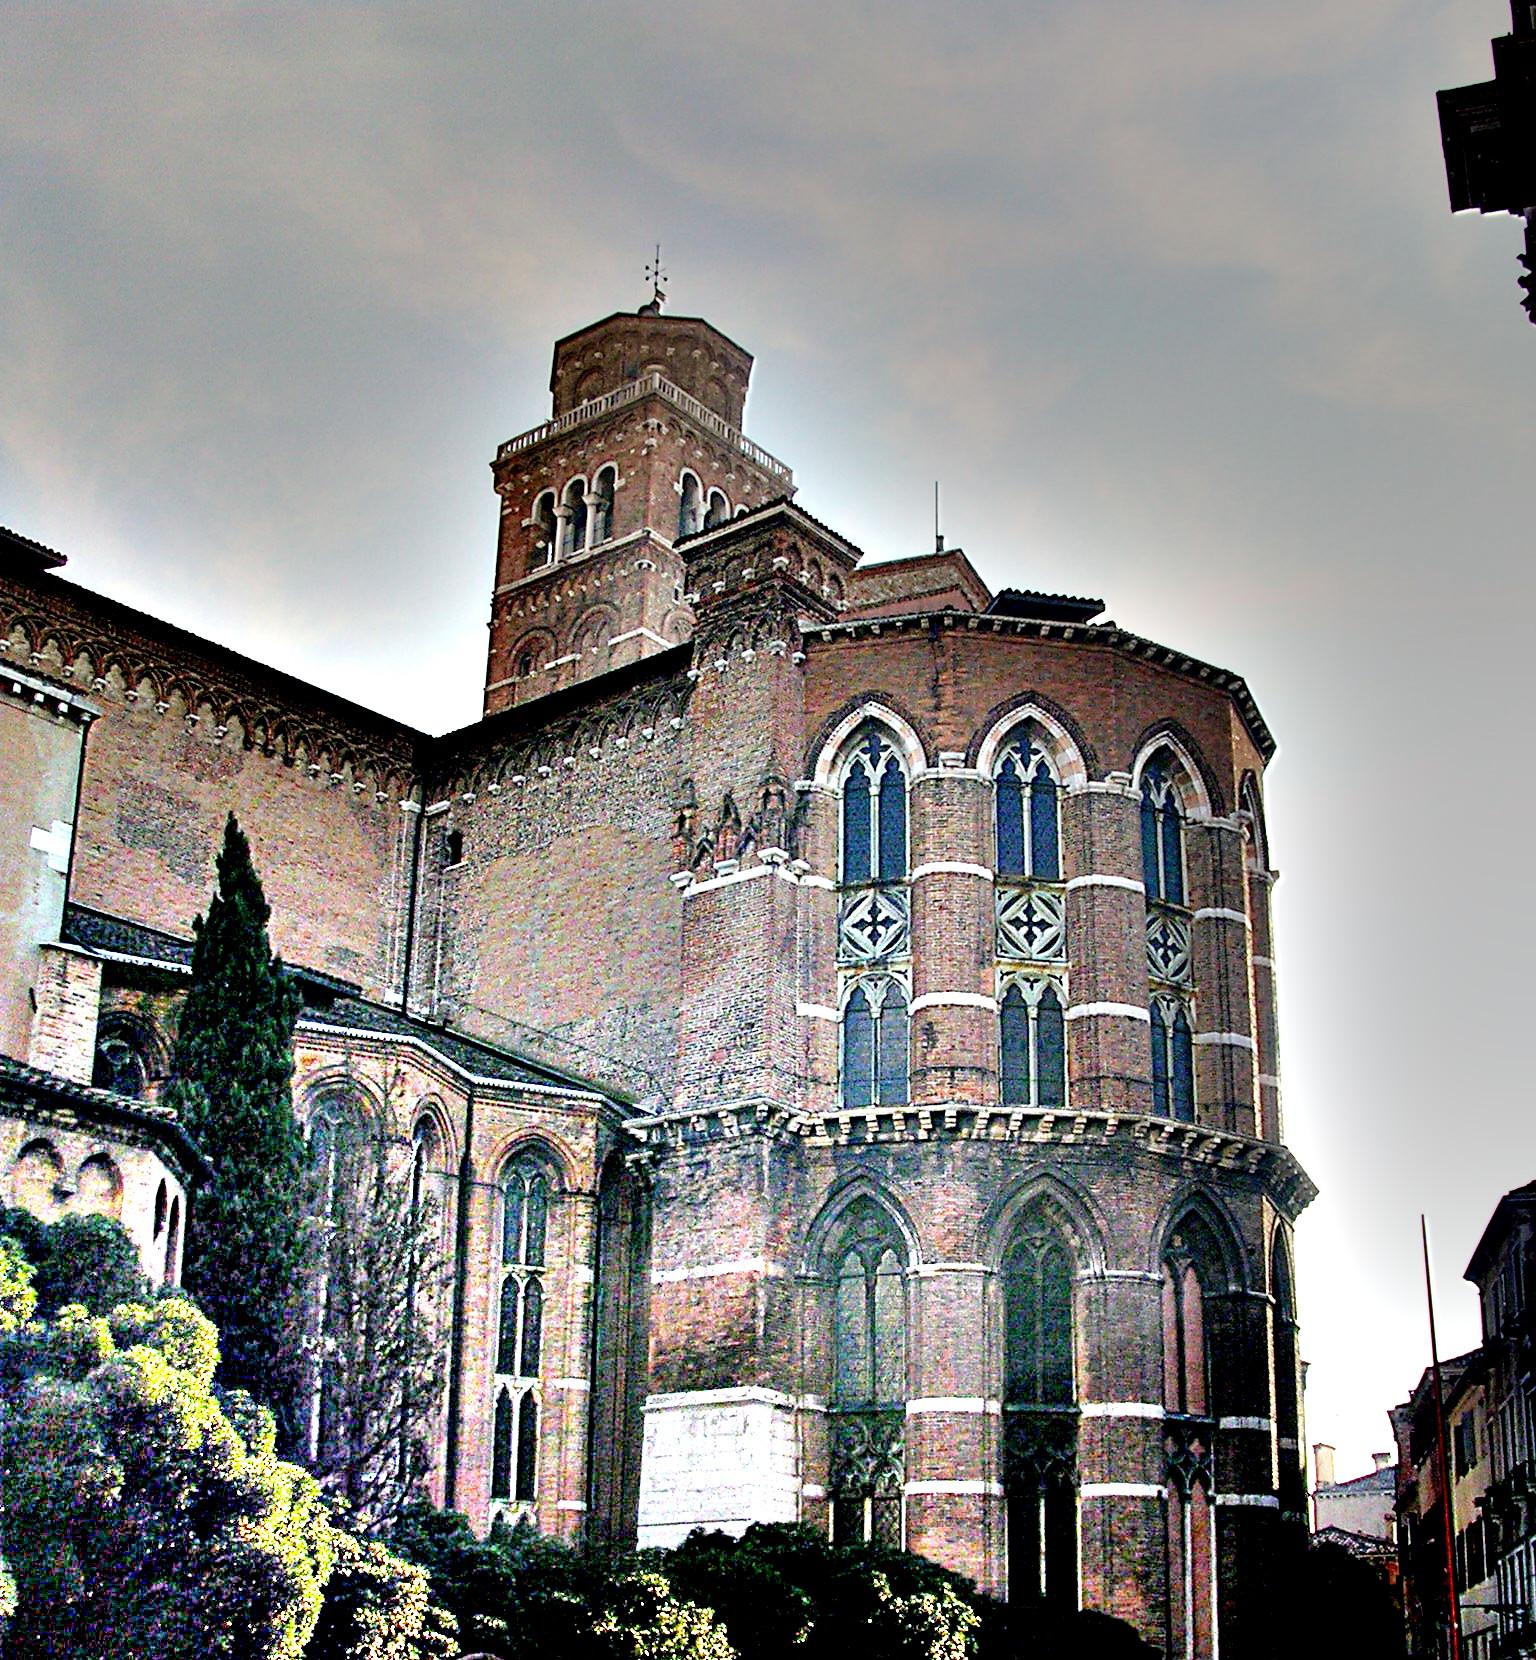 Santa Maria Gloriosa Dei Frari, Venice, Italy